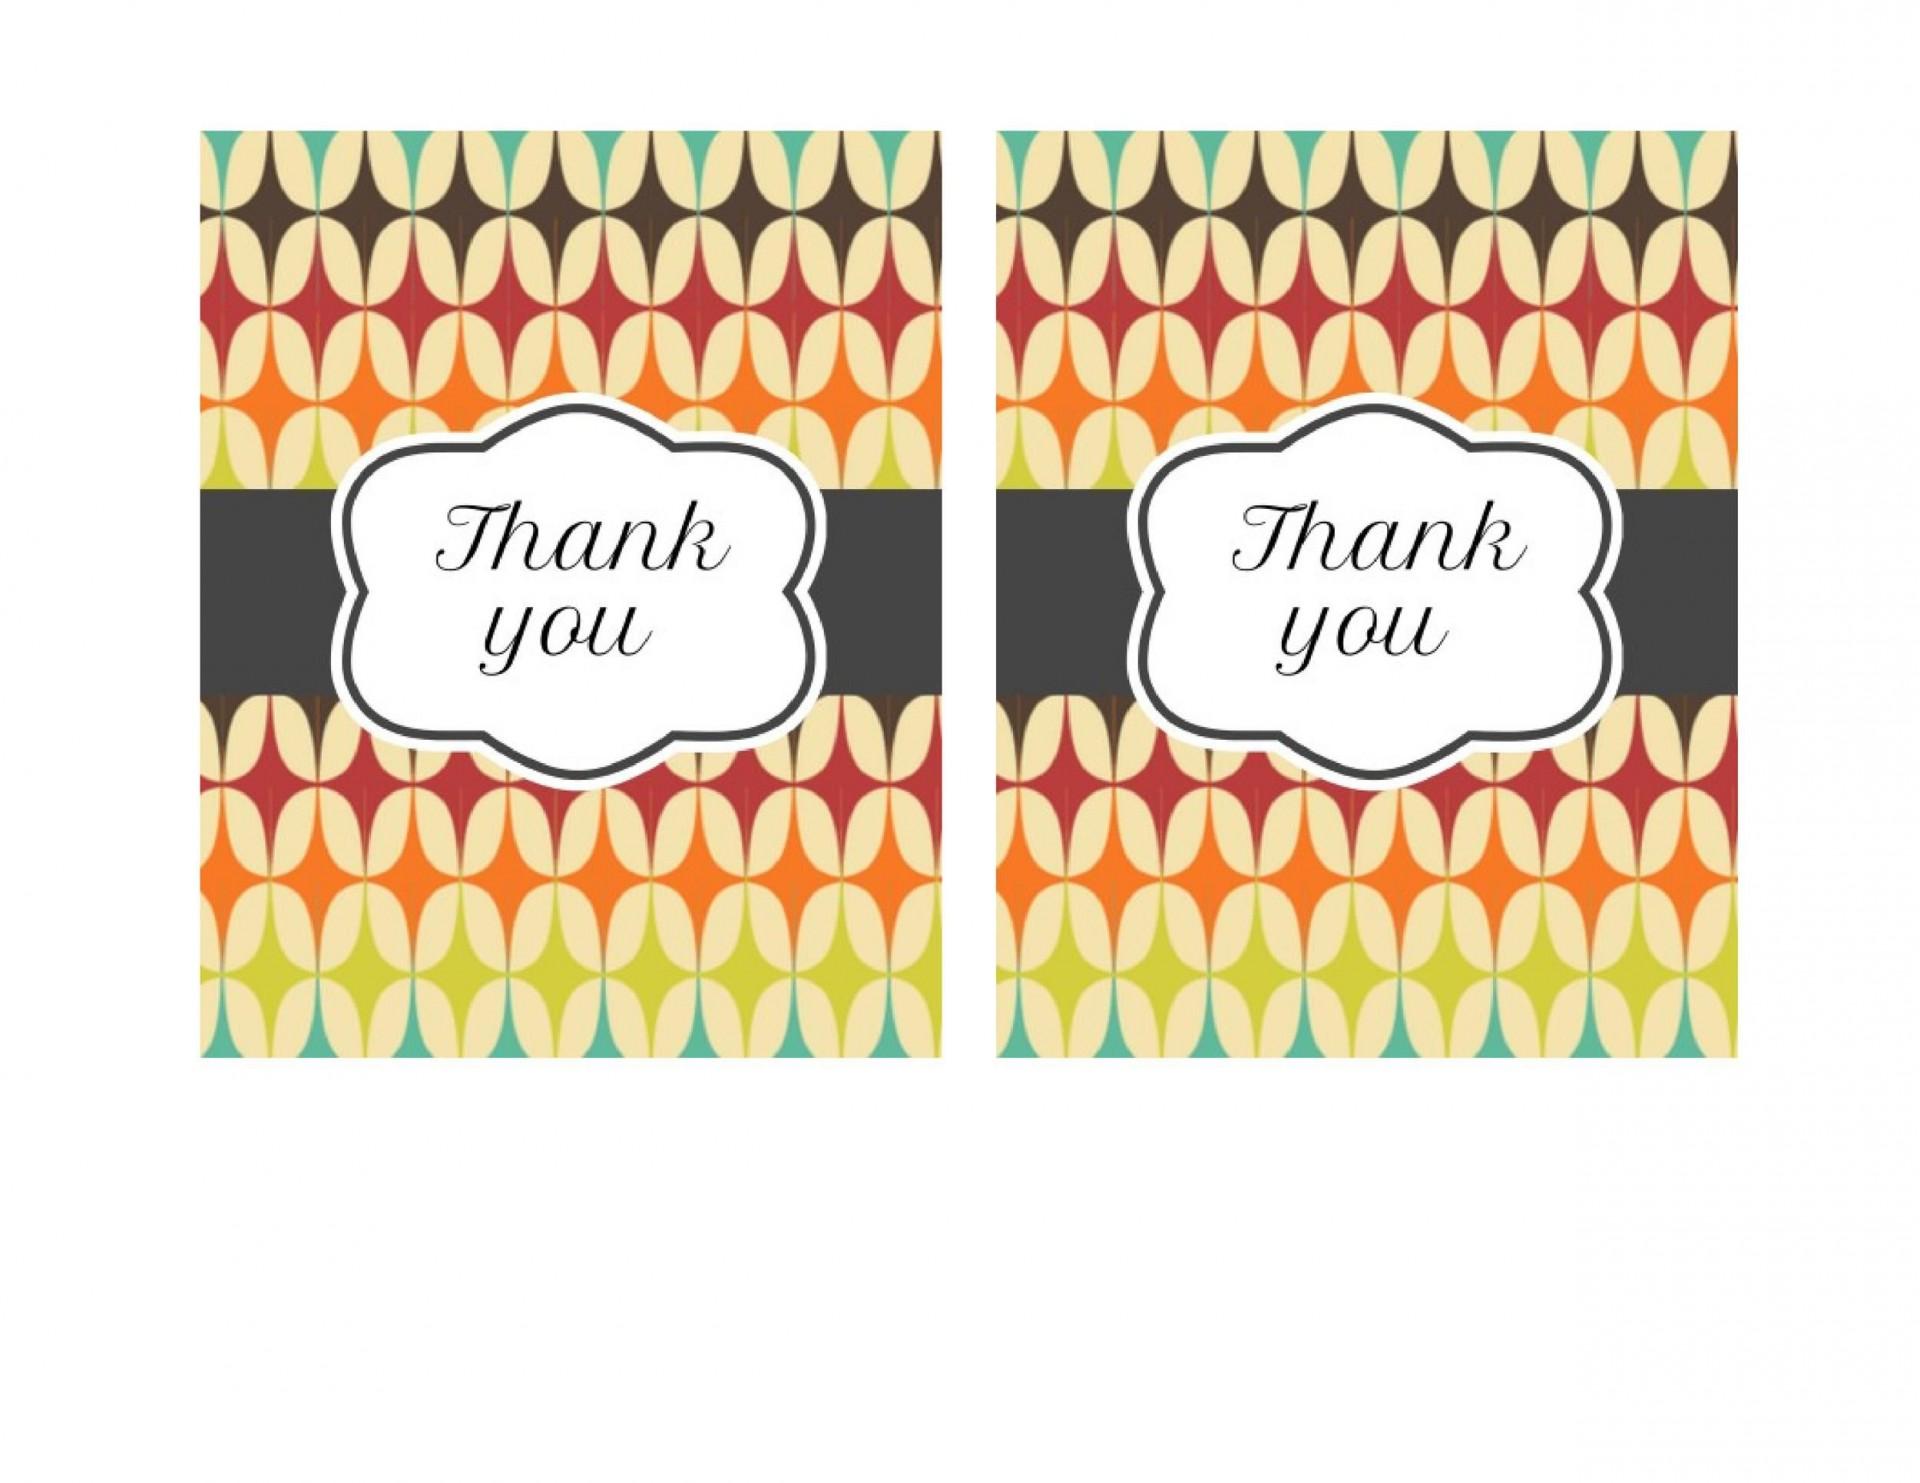 012 Shocking Free Printable Photo Card Template  Templates Birthday Thank You1920